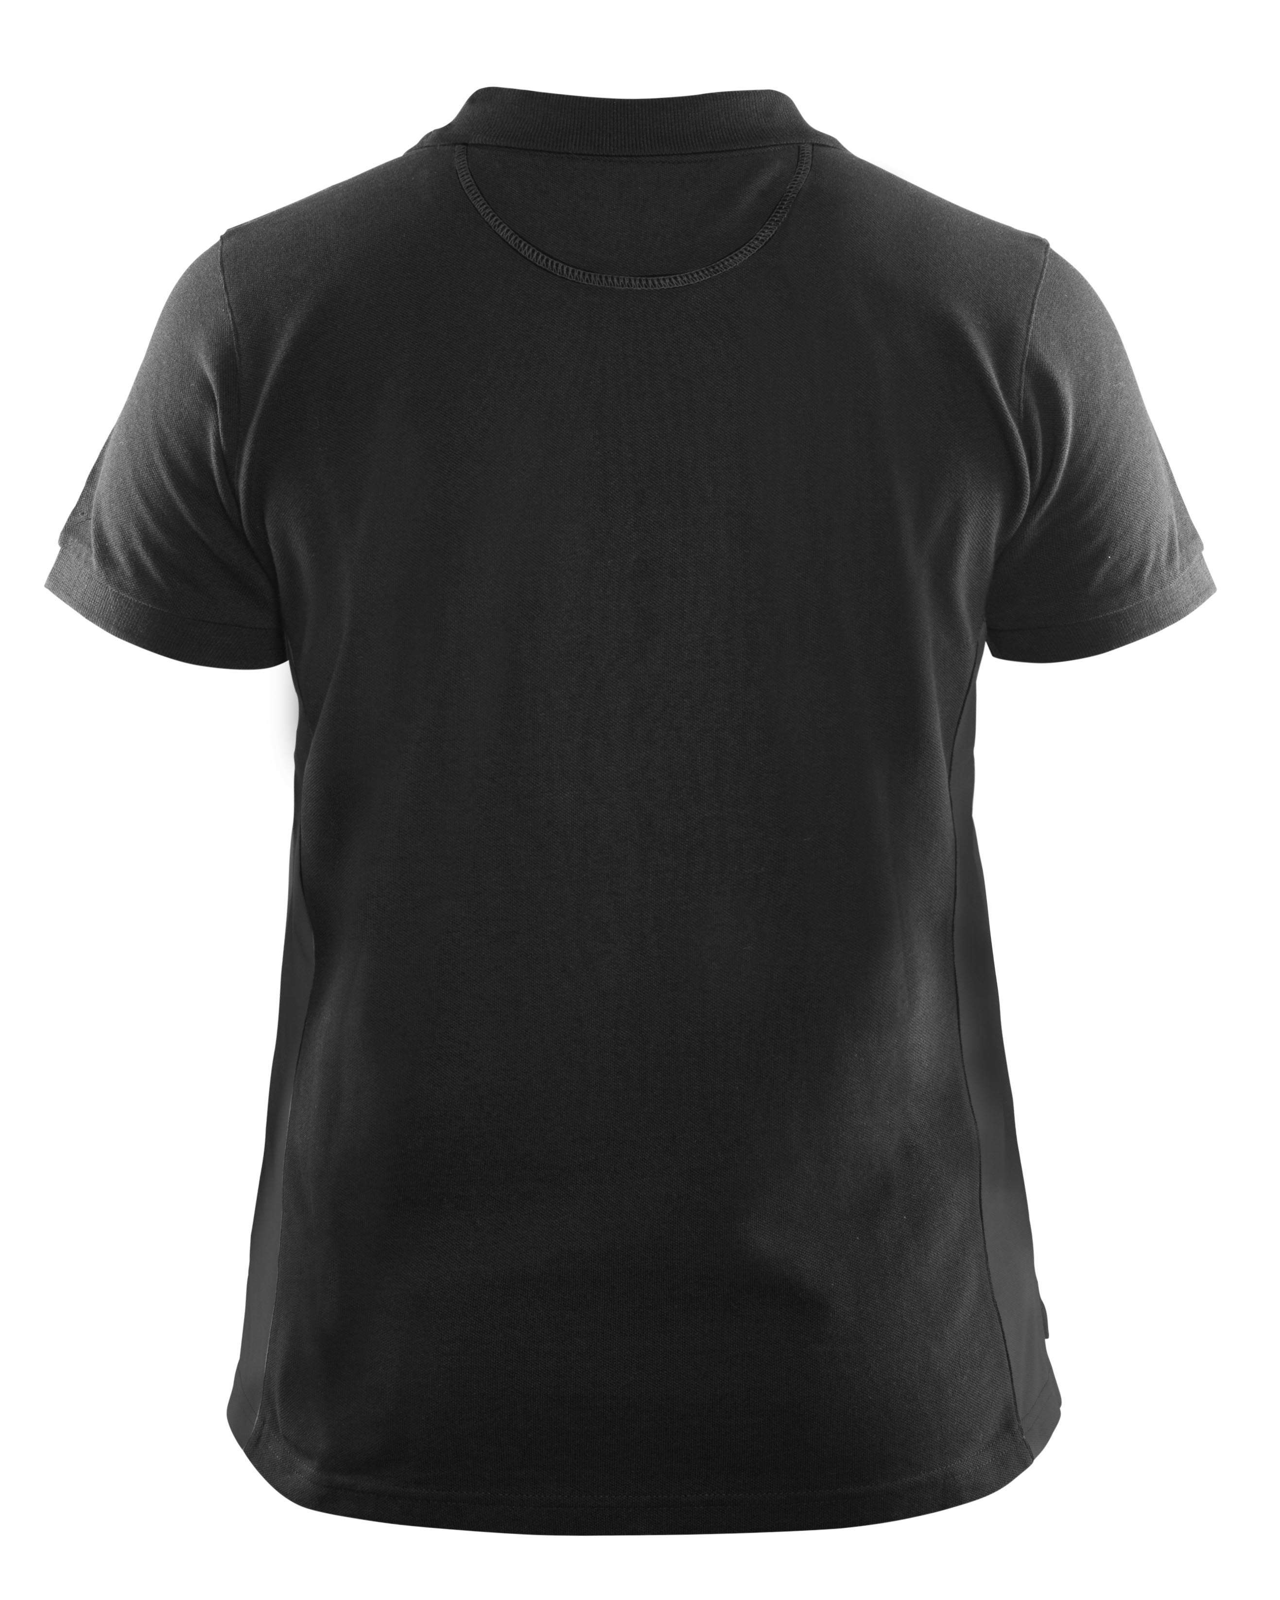 Blaklader Poloshirts 33901050 zwart(9900)